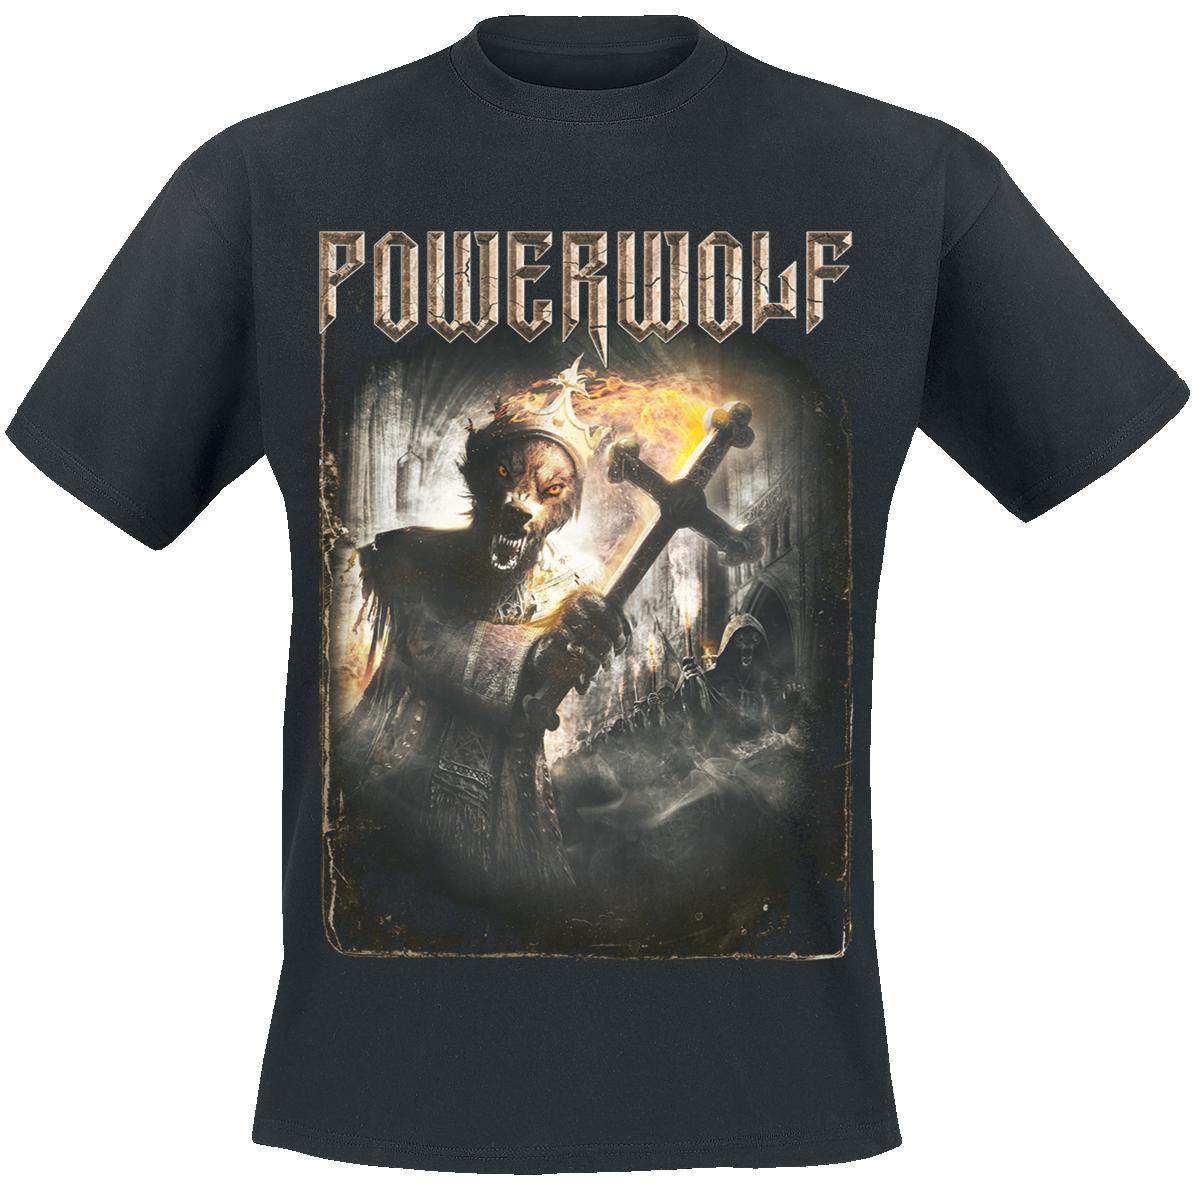 Powerwolf - Preachers Of The Night - T-Shirt - black image